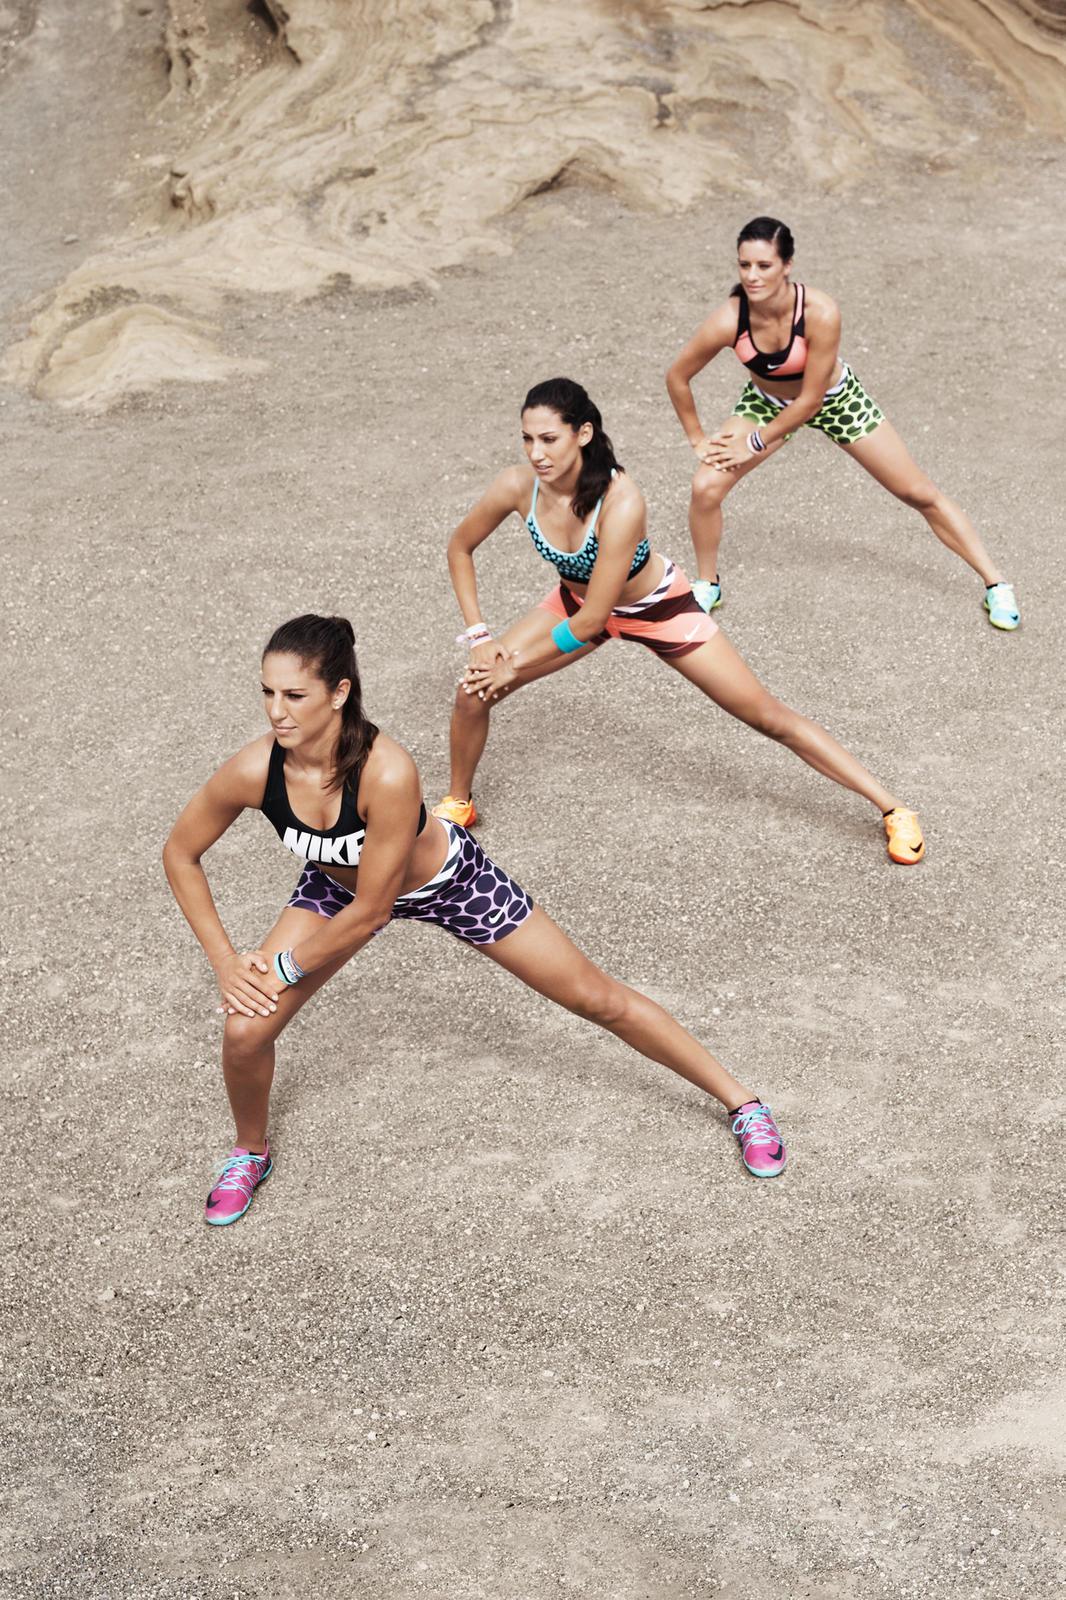 Nike Women Presents: U.S. National Team Midfielder Carli